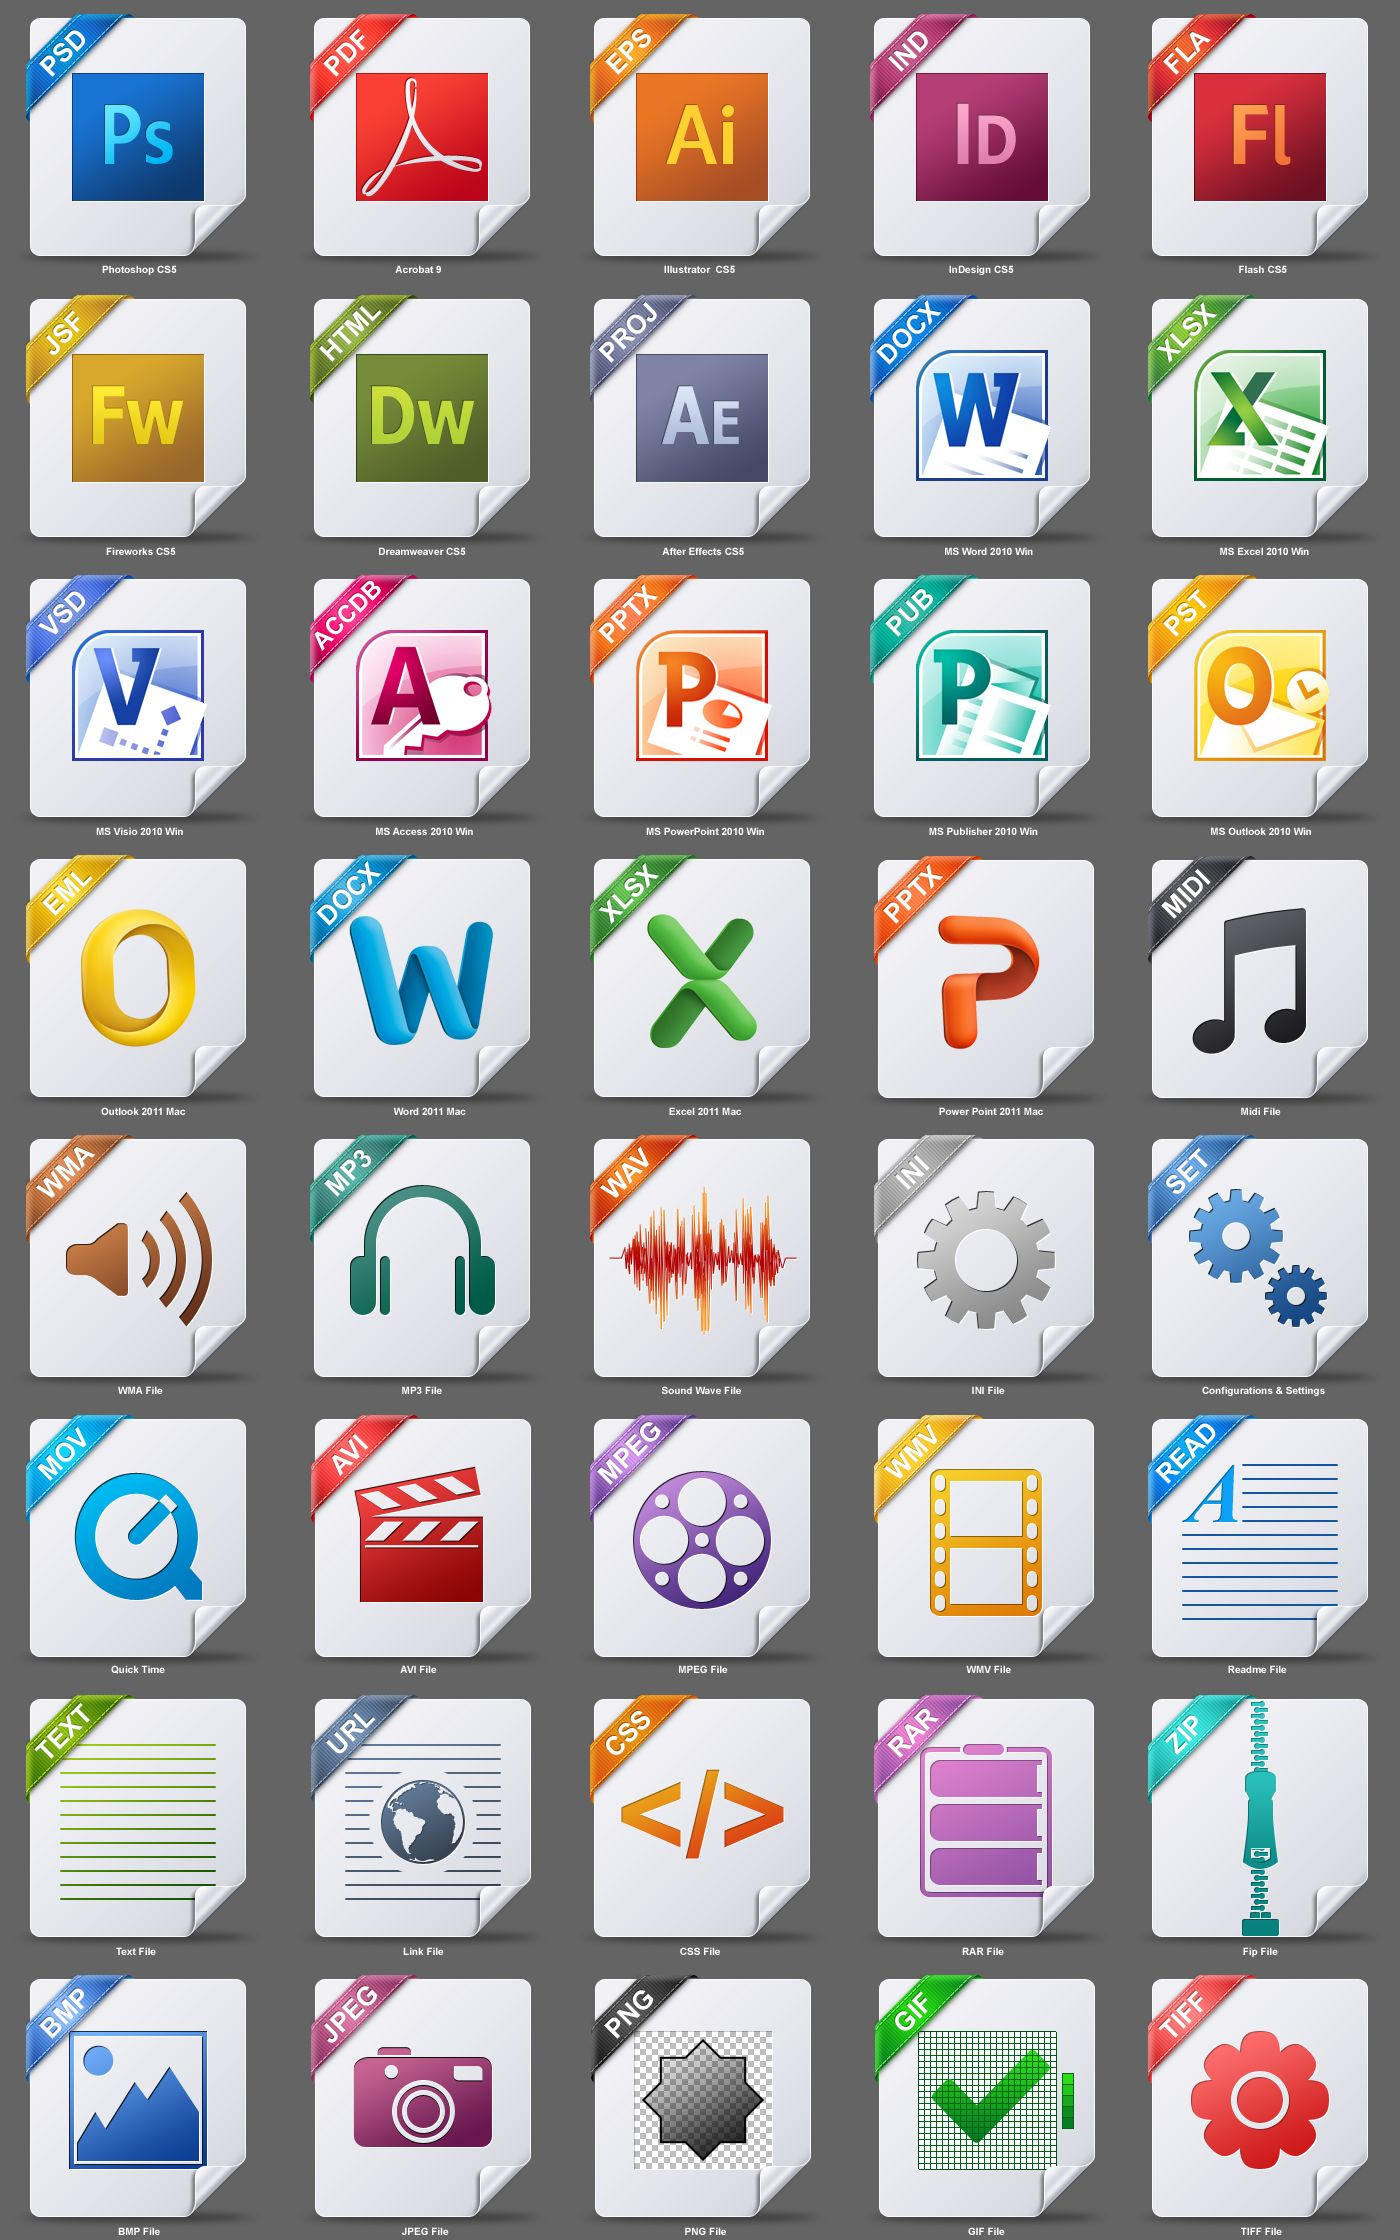 File Type Icons Freebies Pinterest